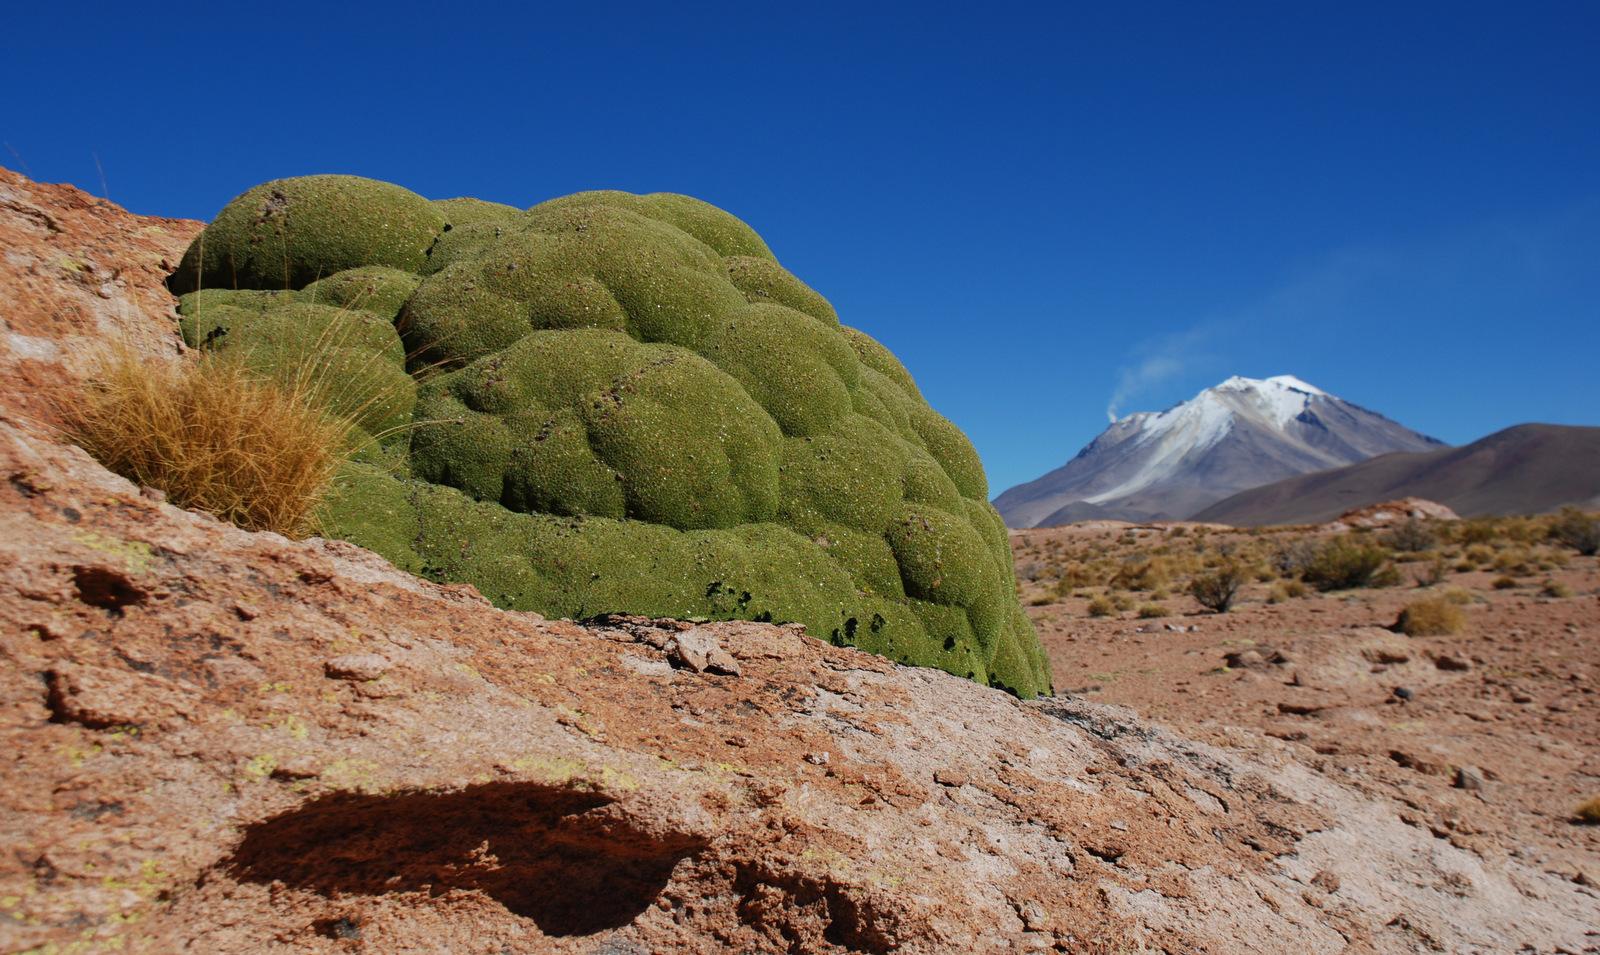 Llareat plant & Ollagüe Volcano